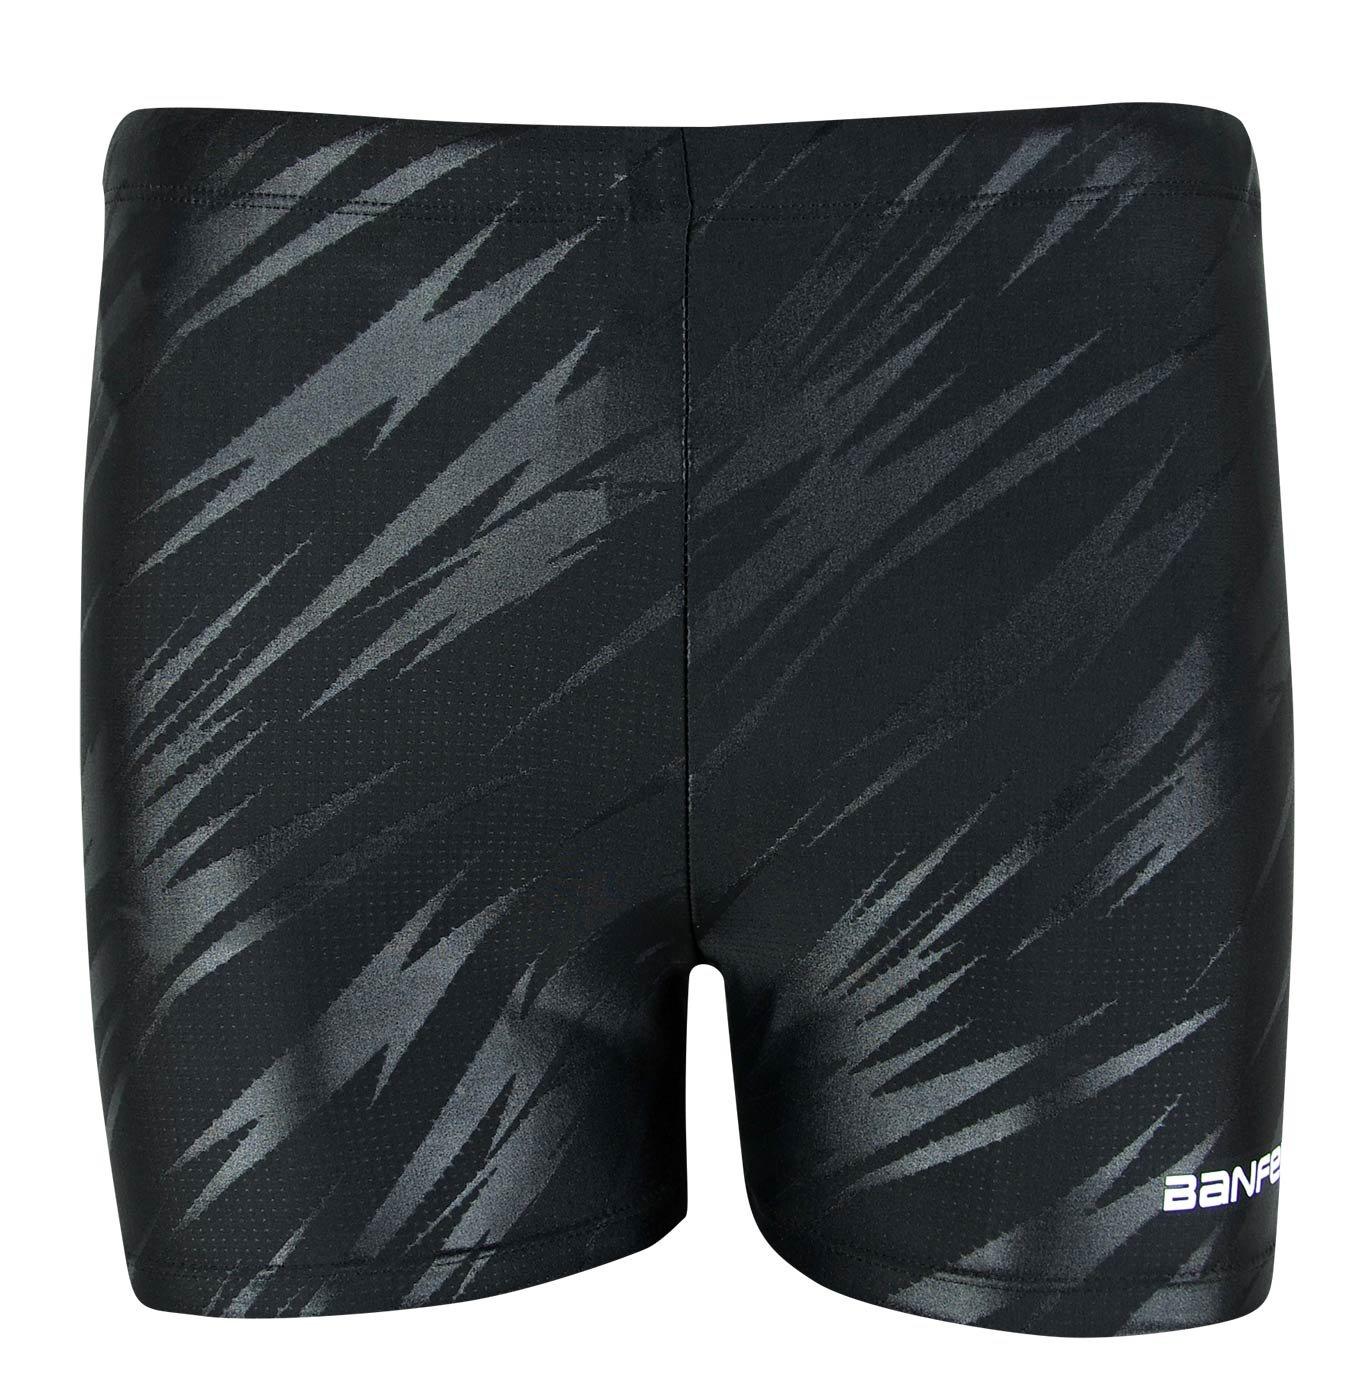 Banfei Men\'s Solid Fashion Rapid Quick Dry Square Leg Swimsuit Swimwear Designed for Performance